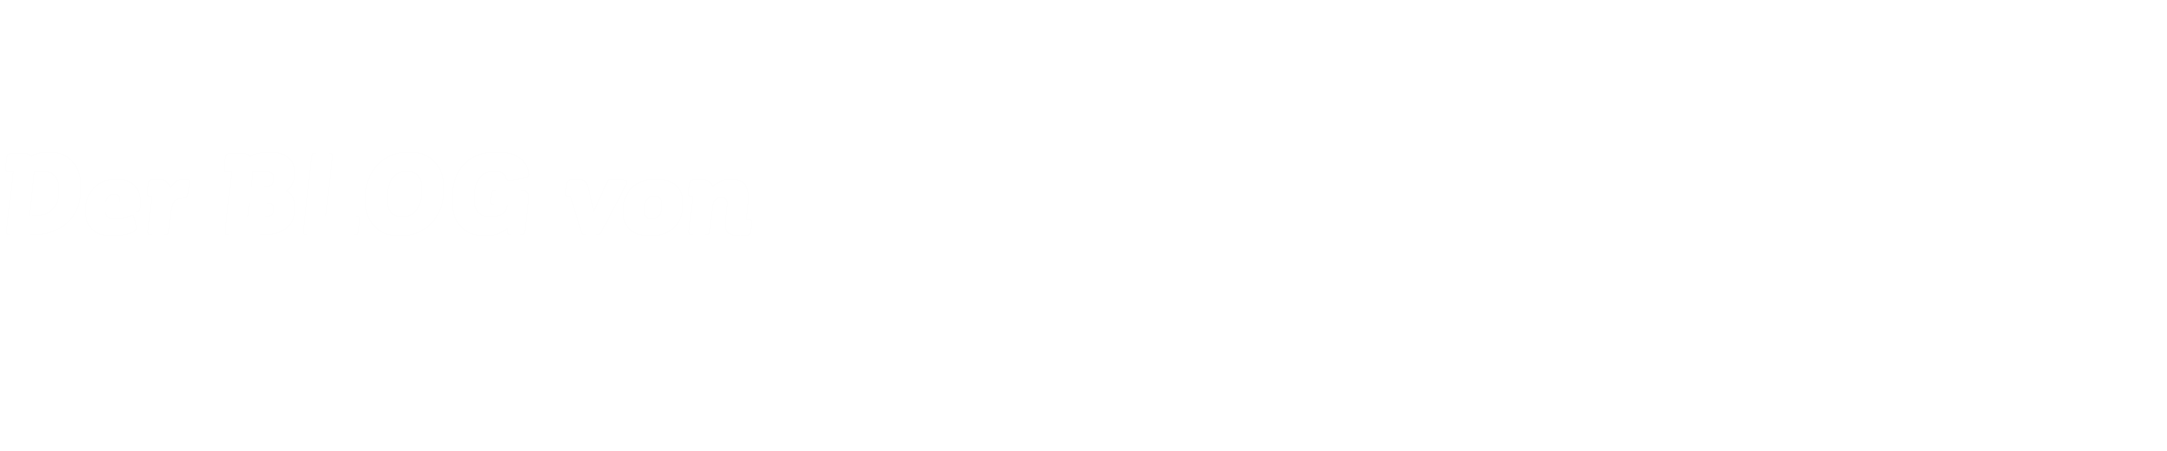 mychoice.info